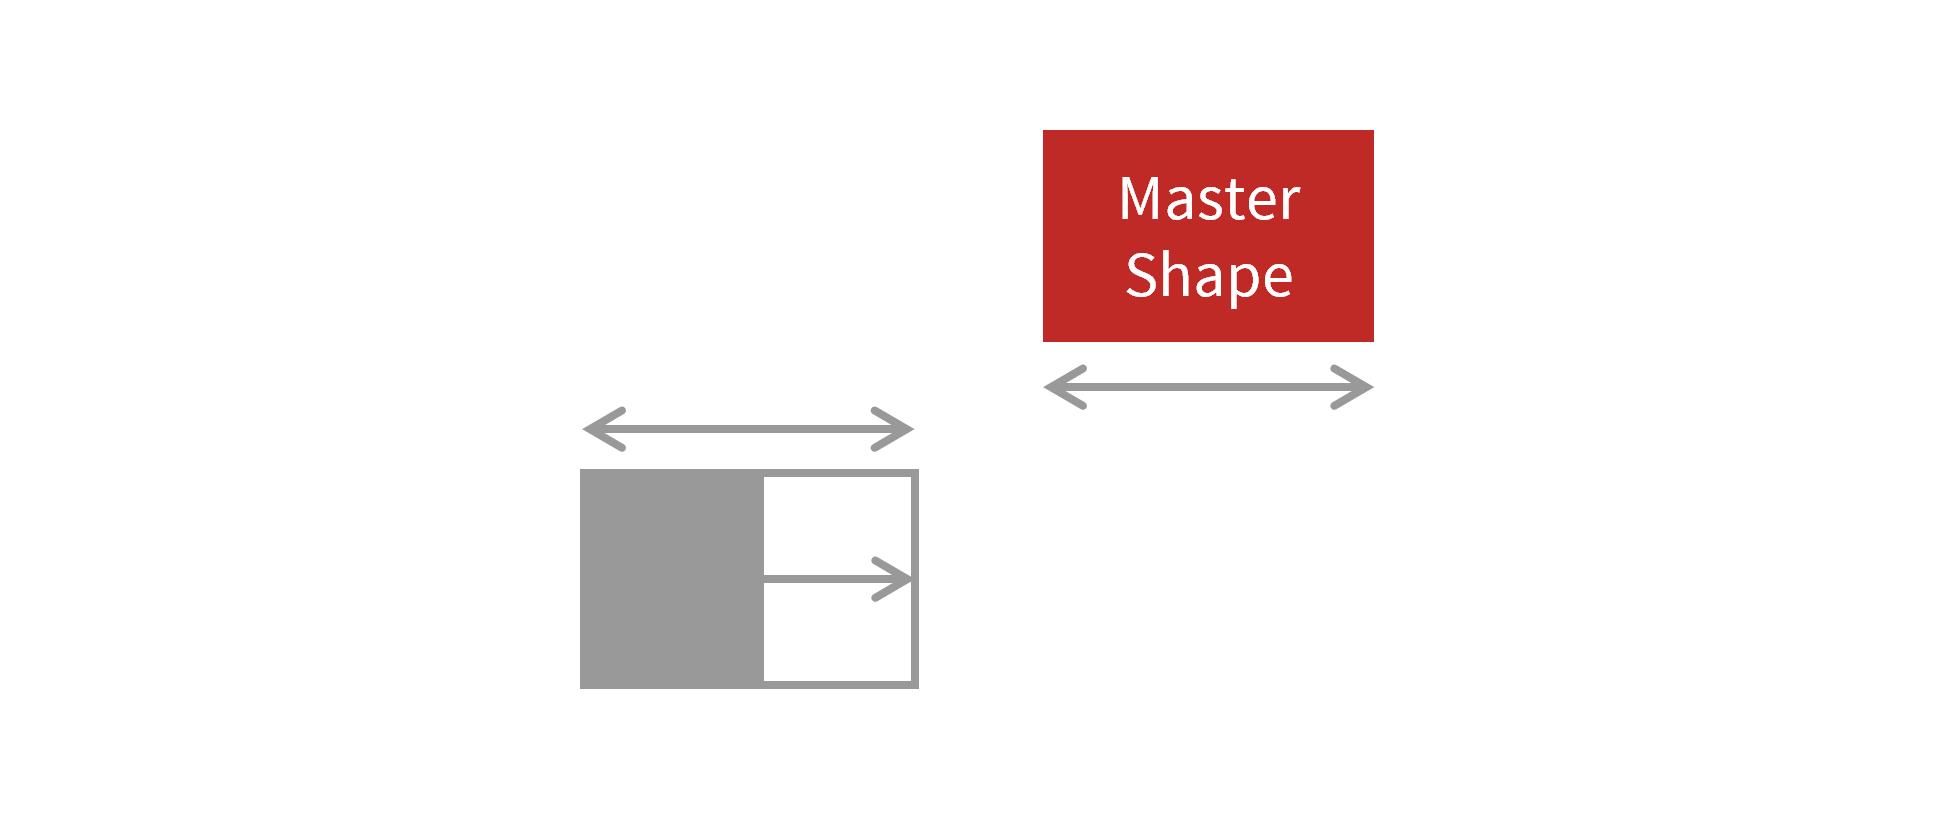 Align Size